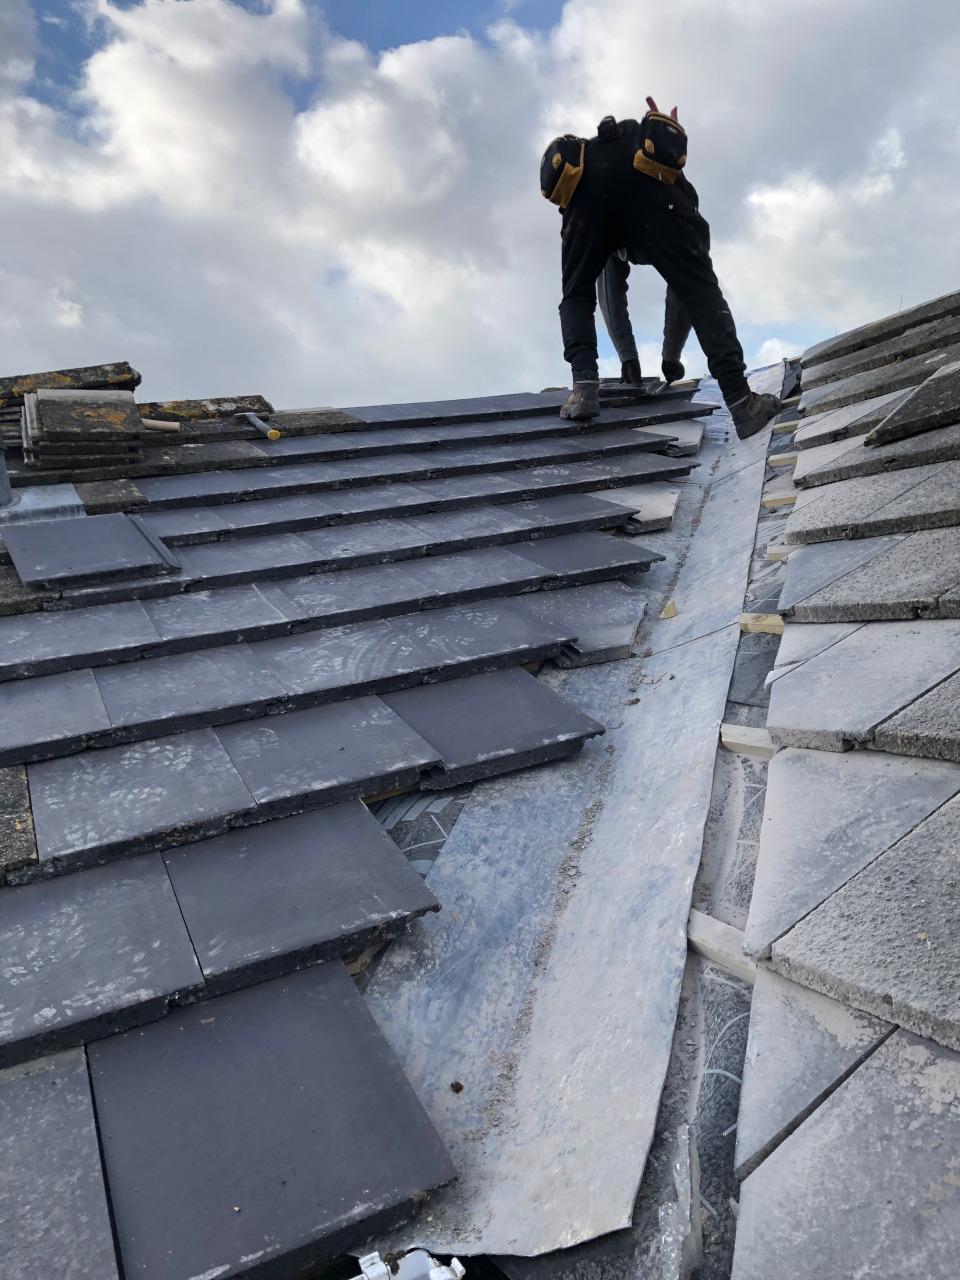 Llandudno tiled roof repair.